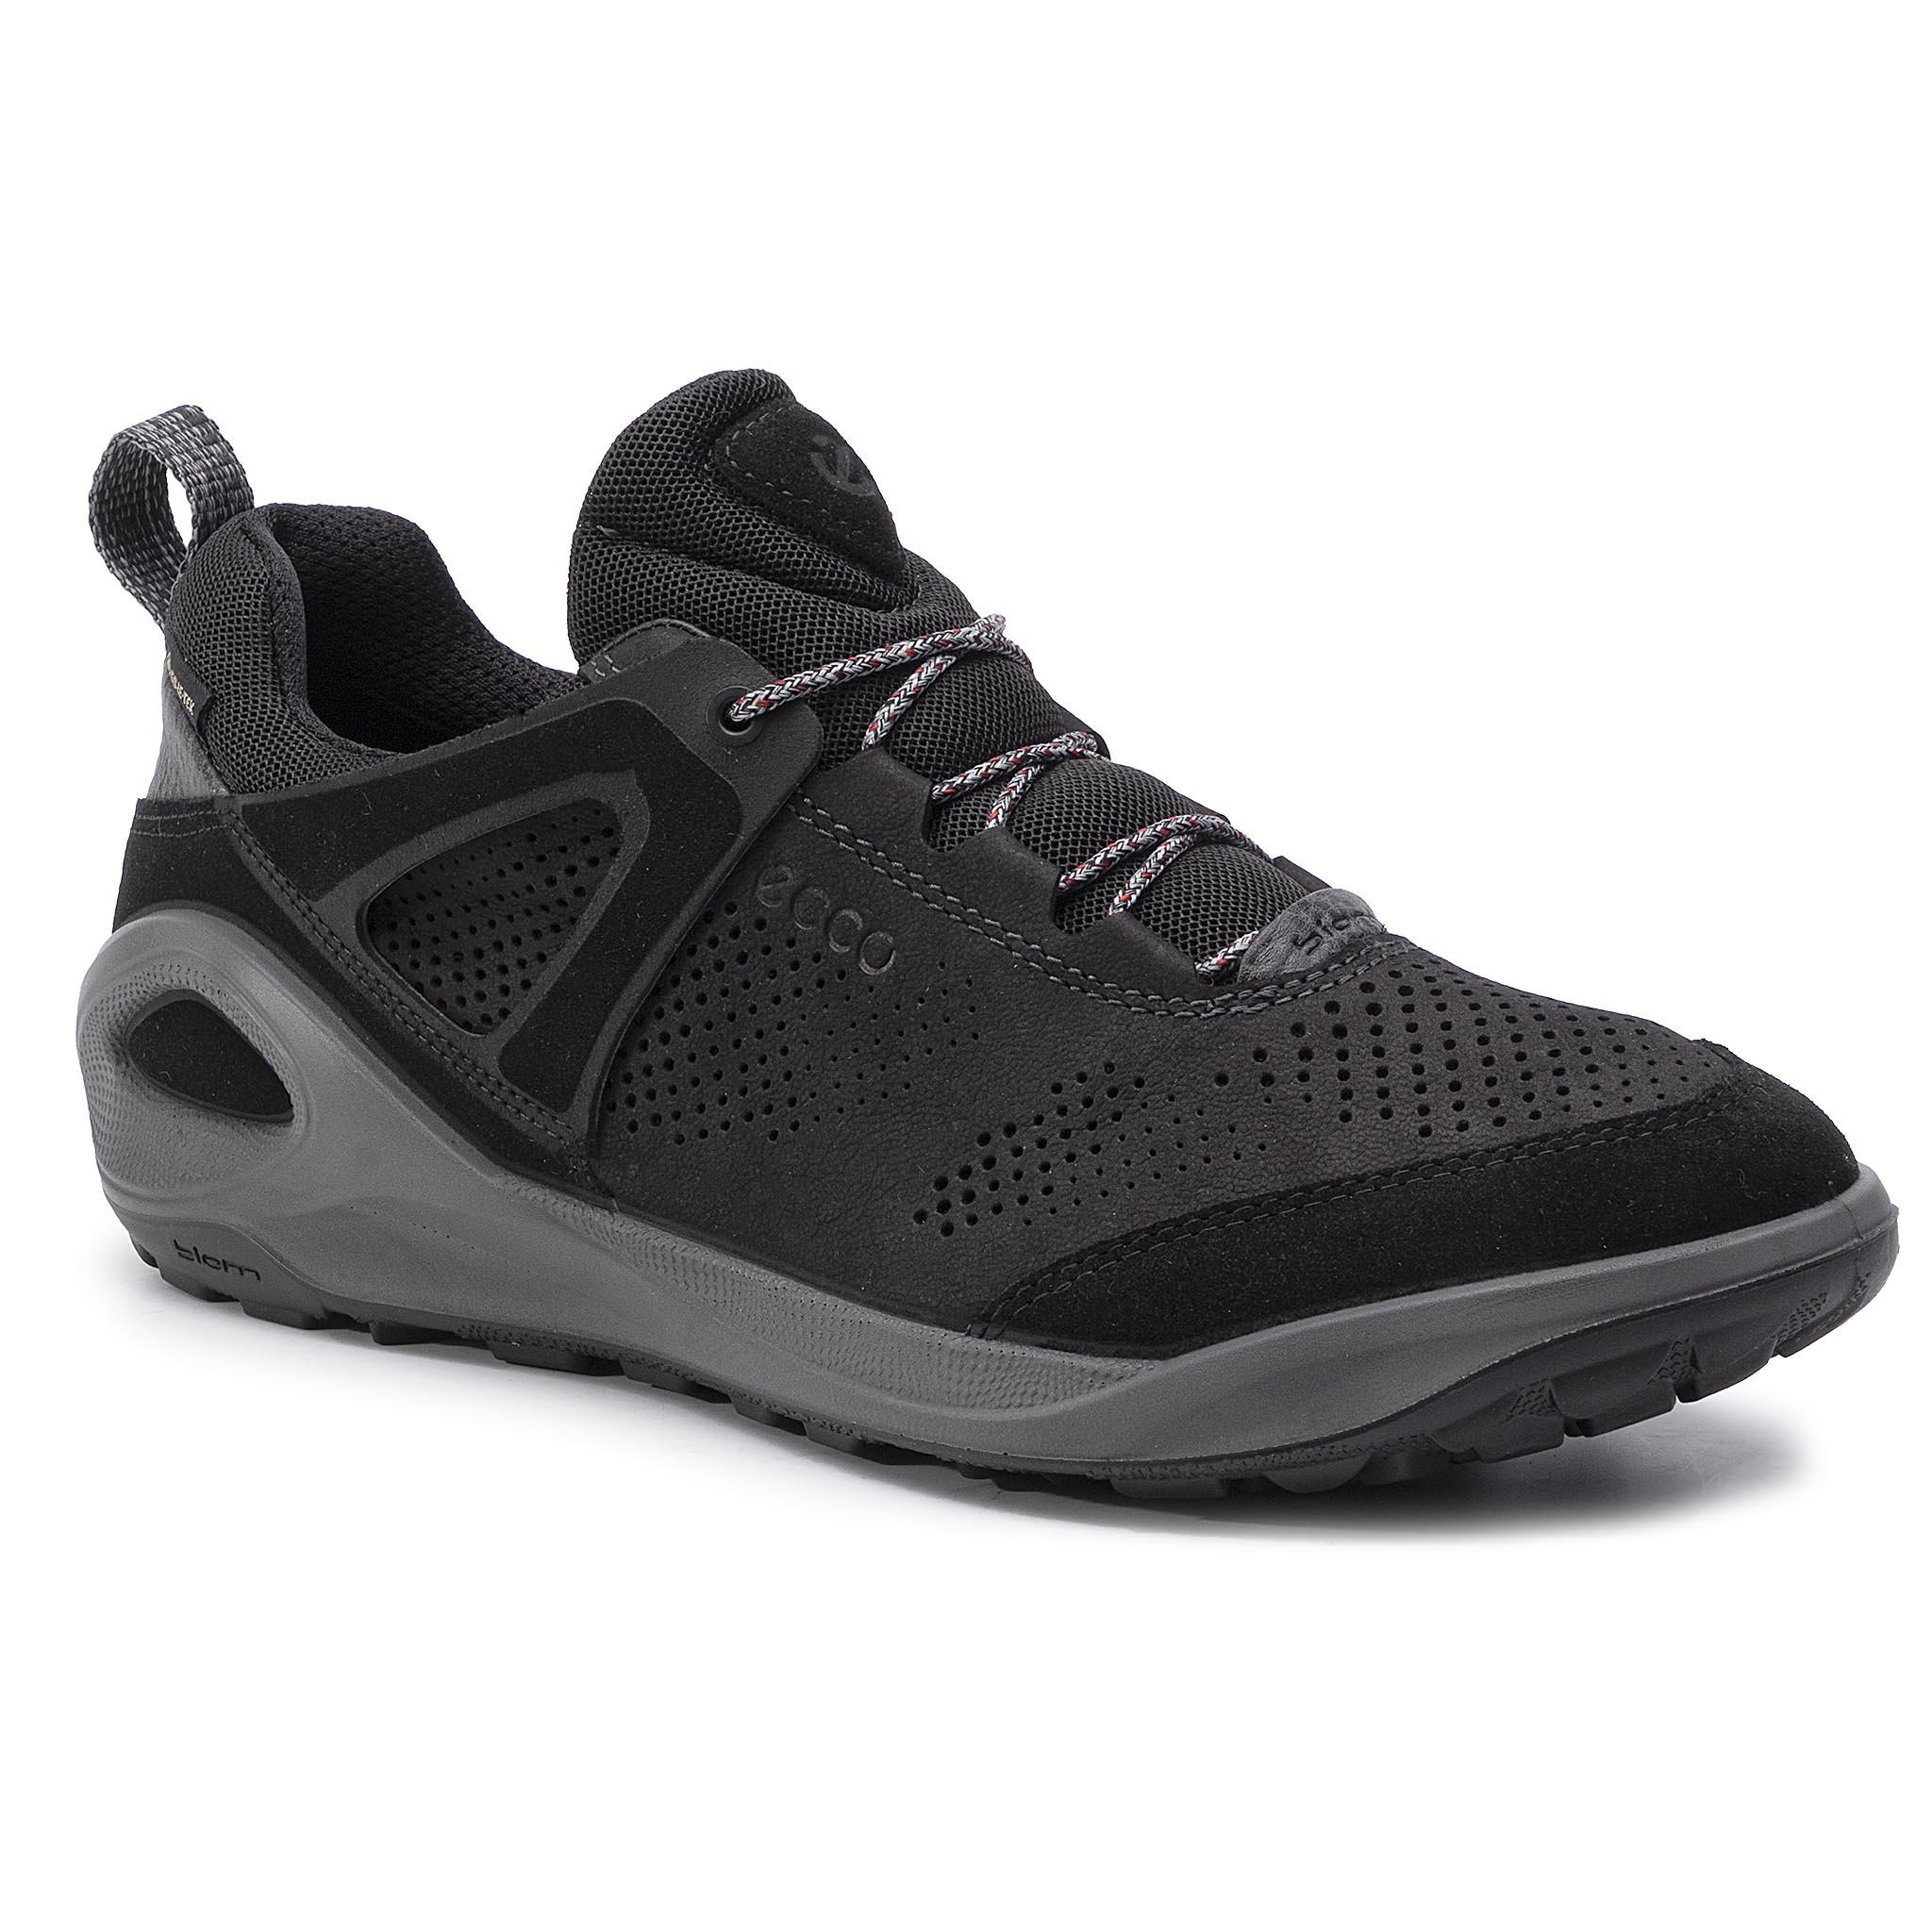 Trekingová obuv ECCO - Biom 2Go GORE-TEX 80190451052 Black/Black